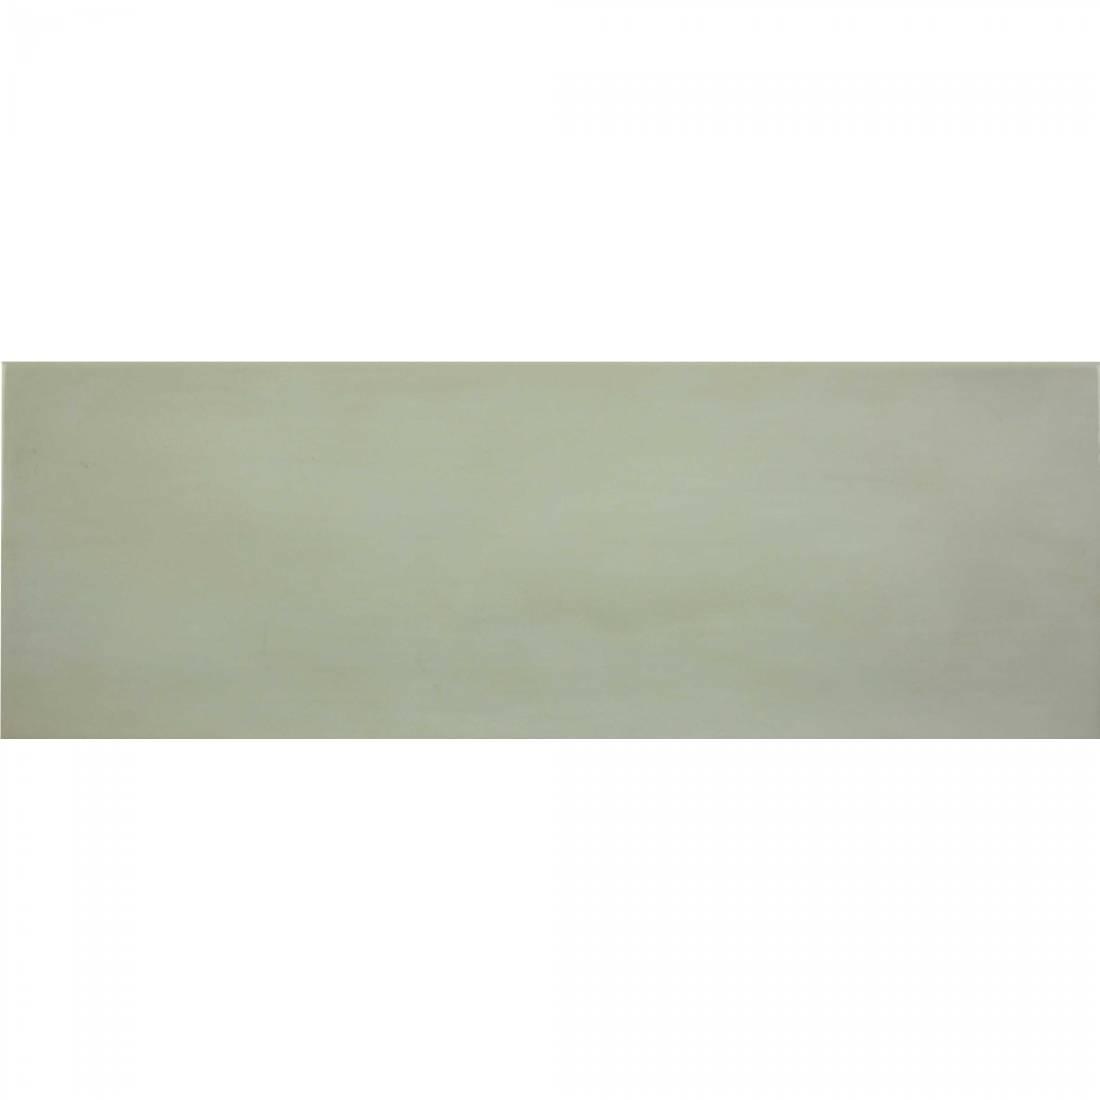 Arlette 21.4x61 Beige Gloss 1